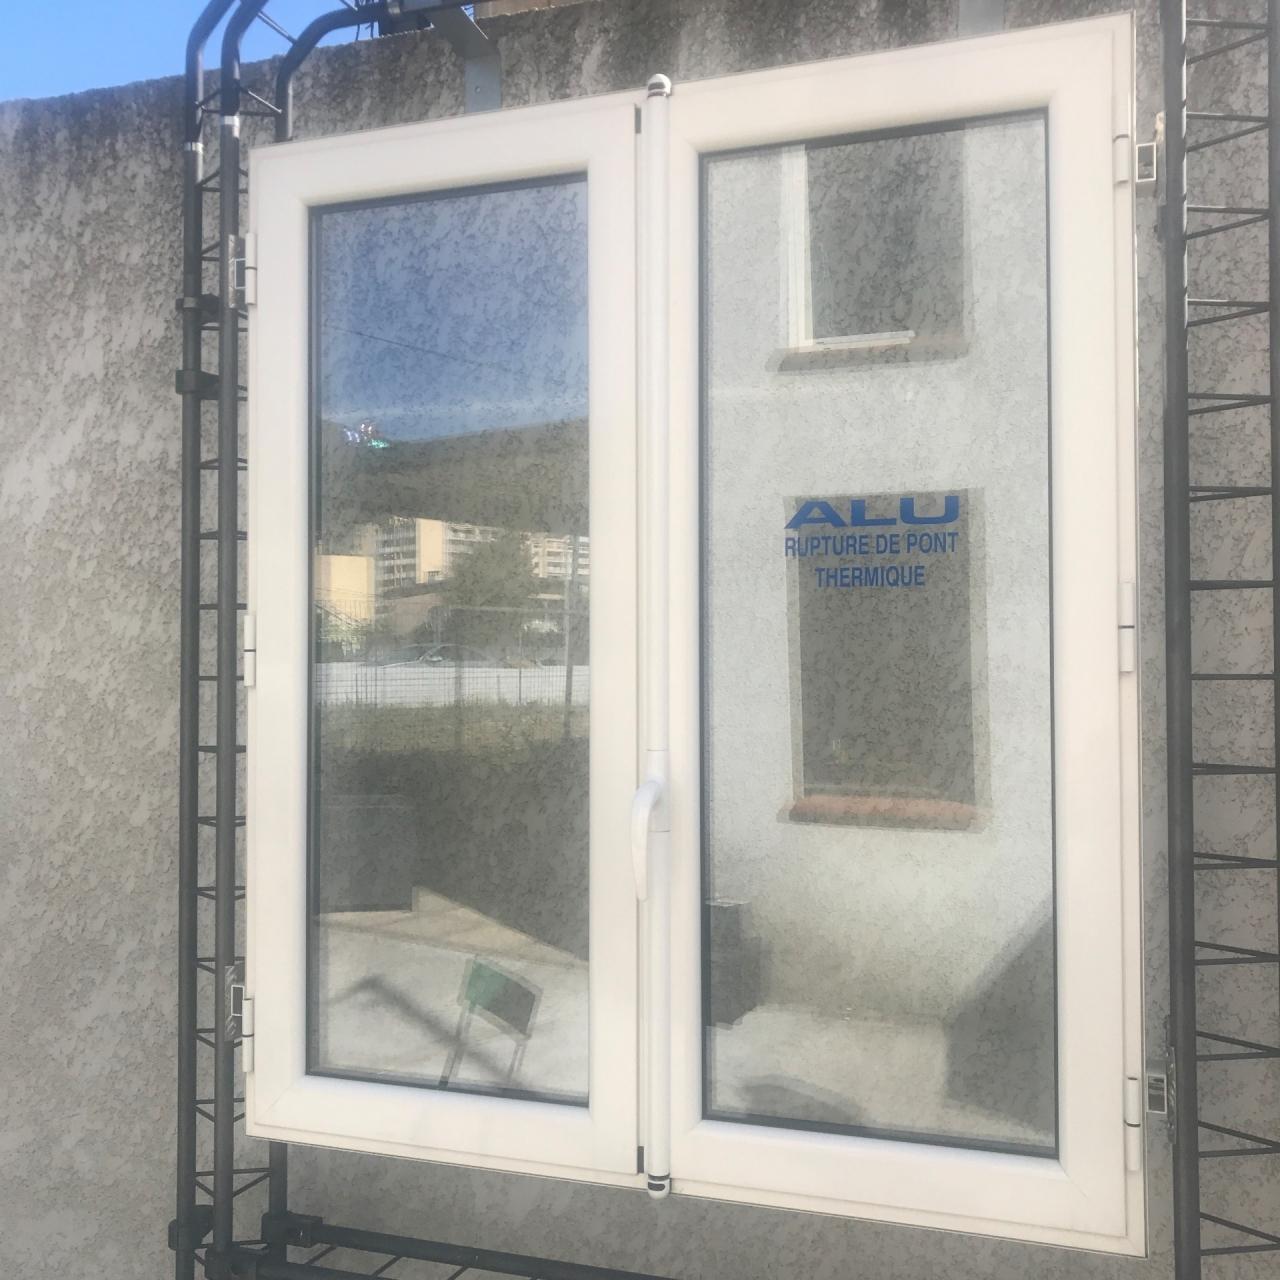 Mentor Alu Pvc Stores Poignée De Fenêtre Alu Adaptable